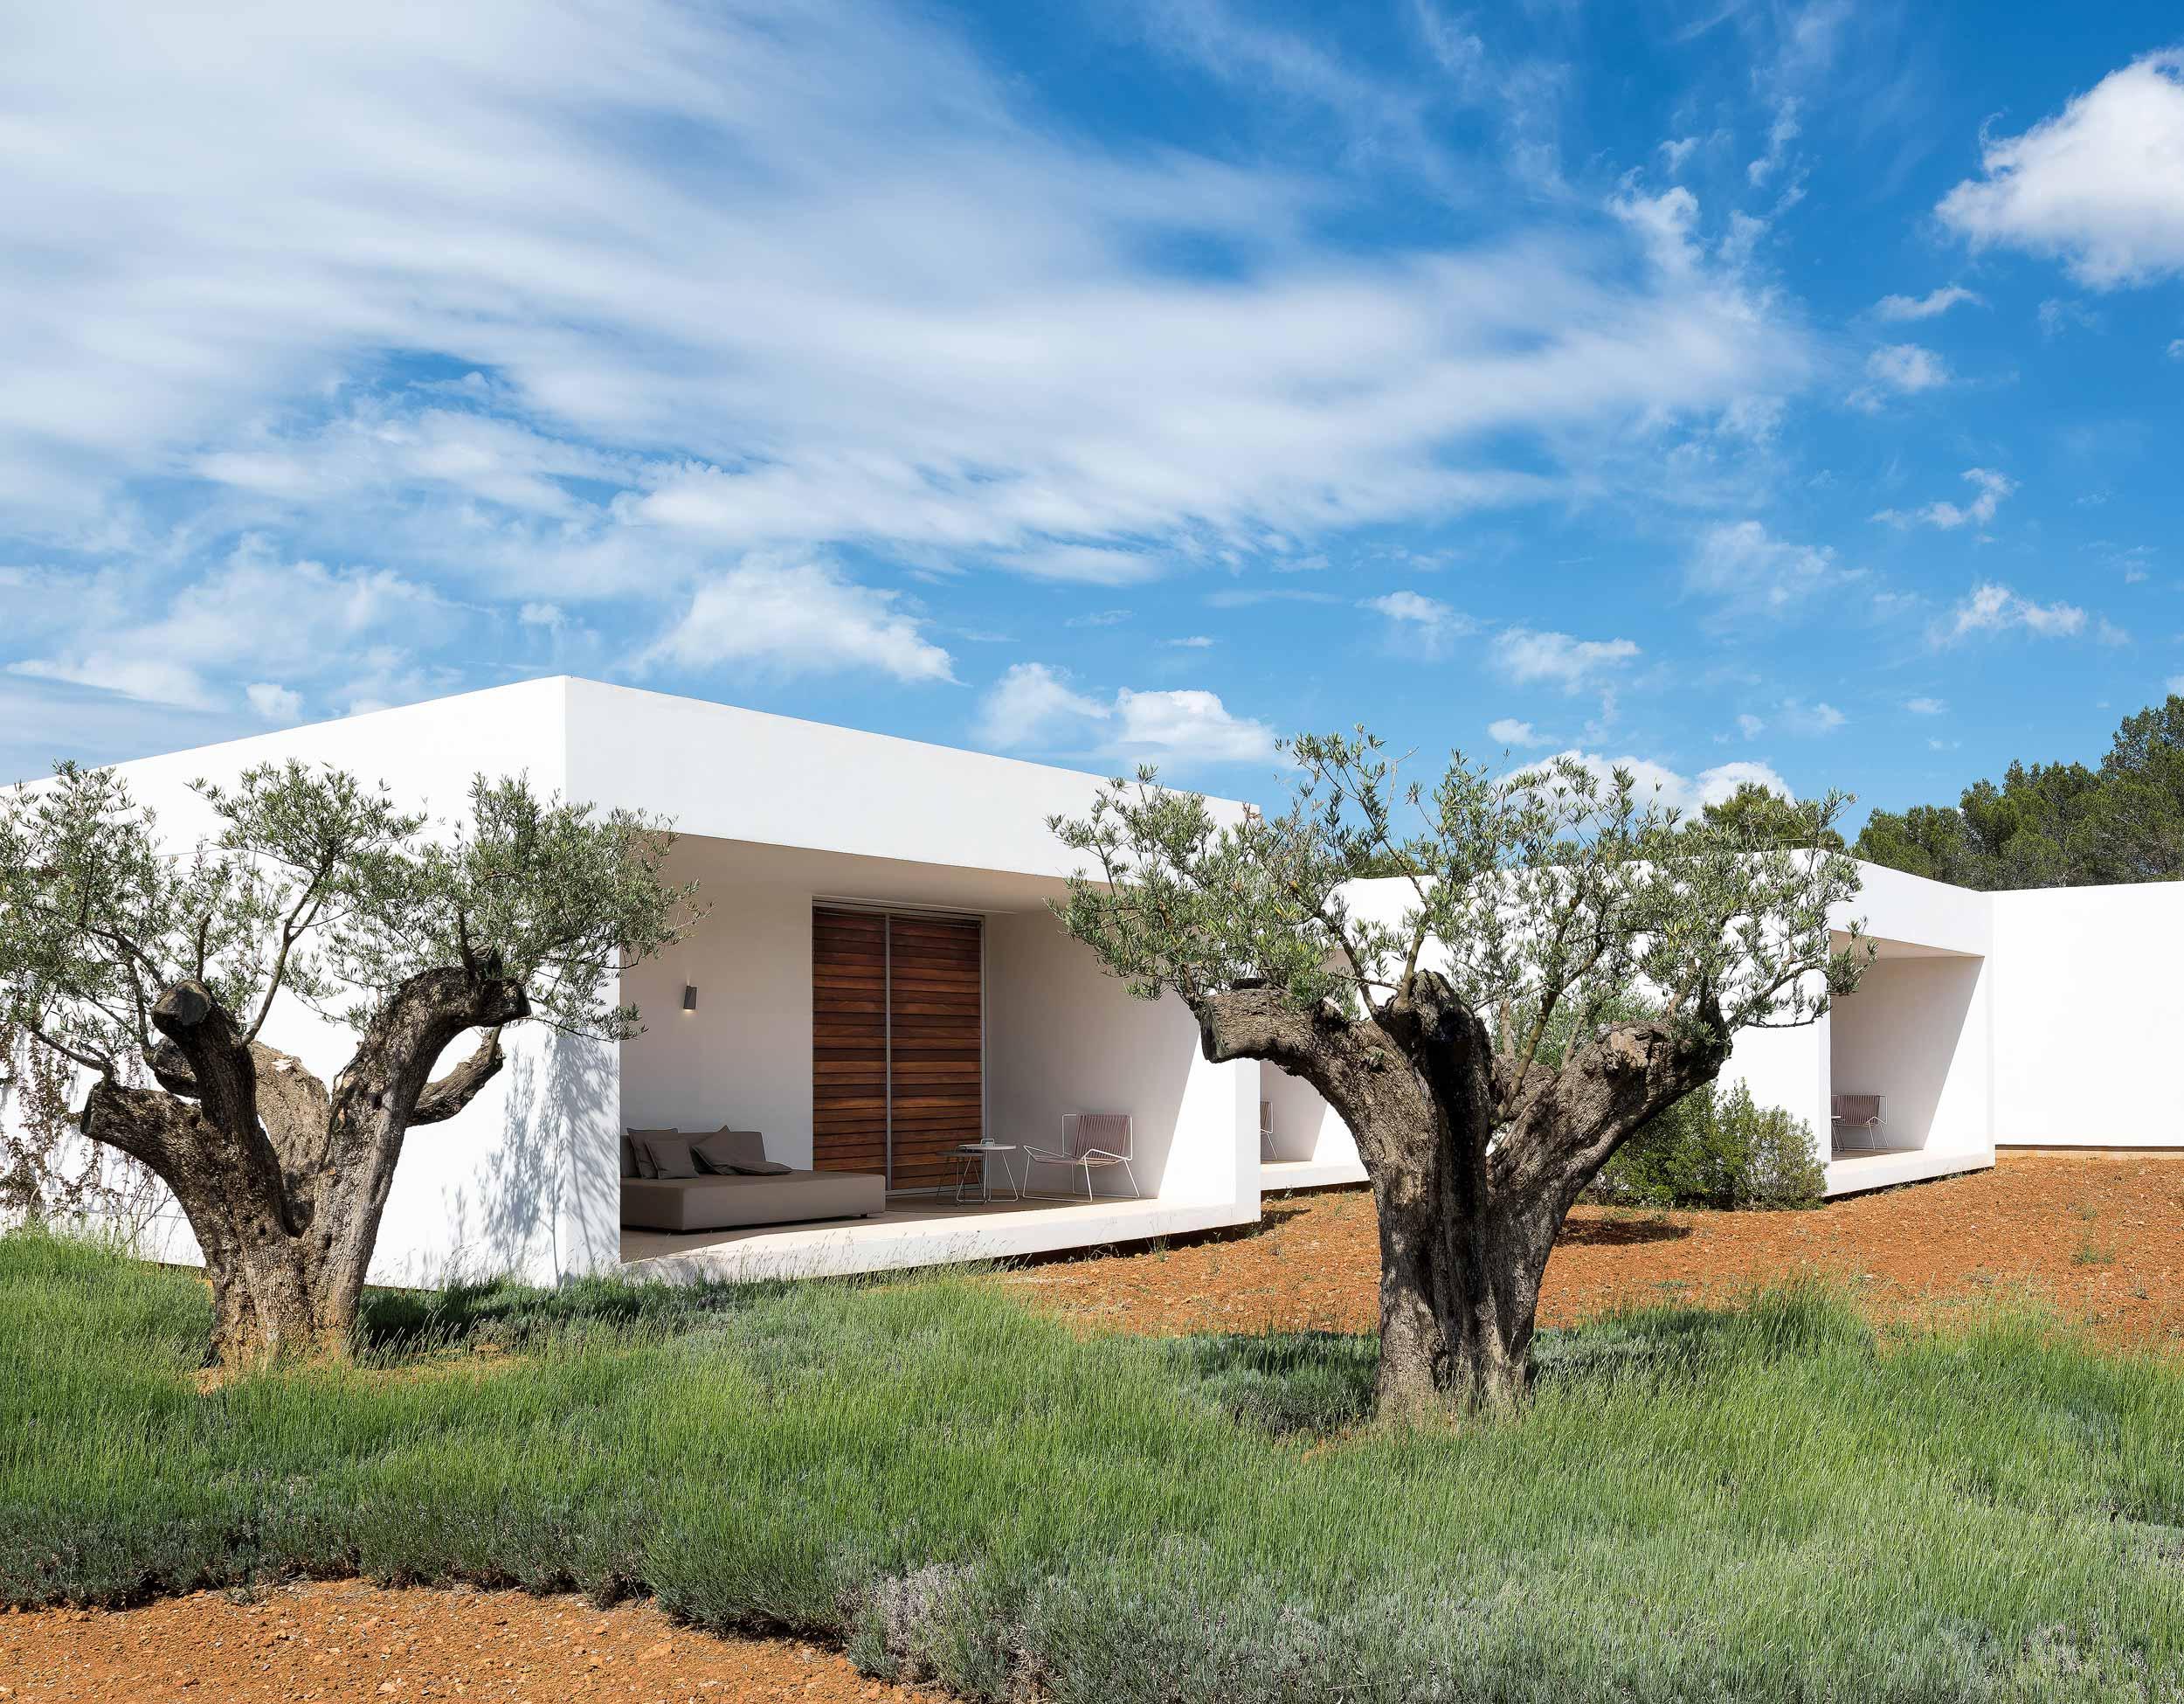 Ca Na Xica, Ibiza - architectuurfotograaf Chiel de Nooyer